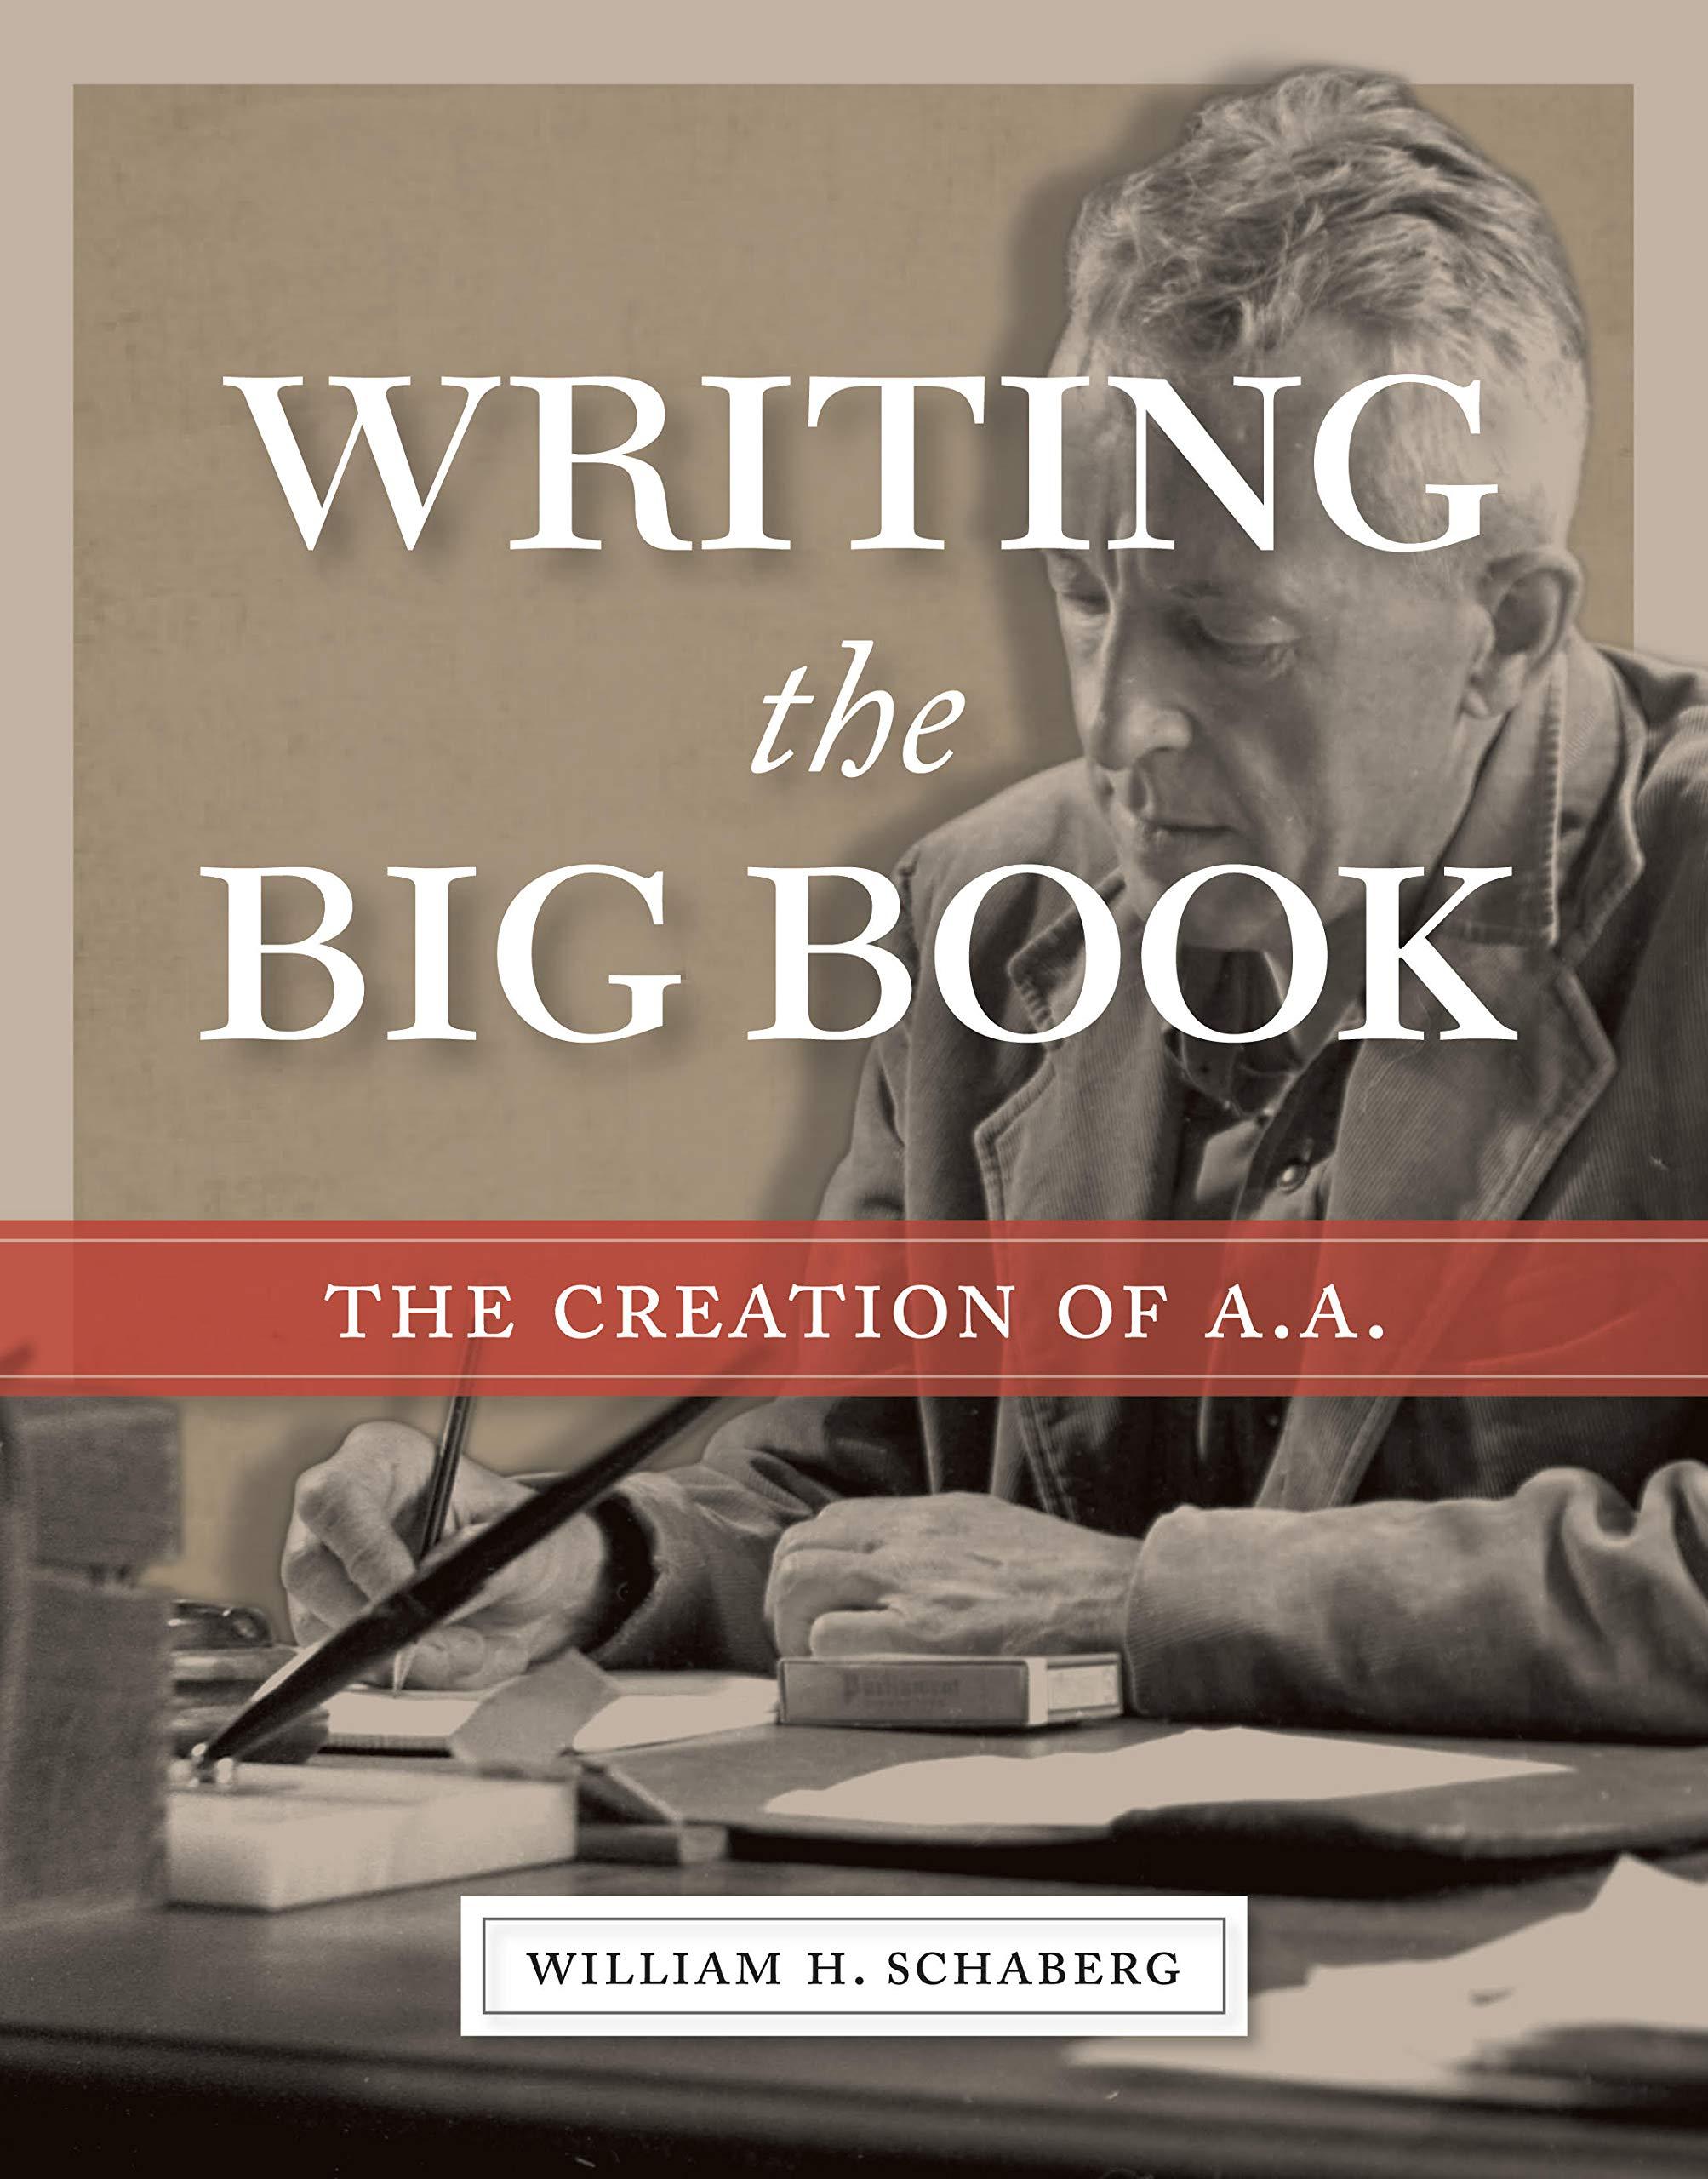 writingthebigbook